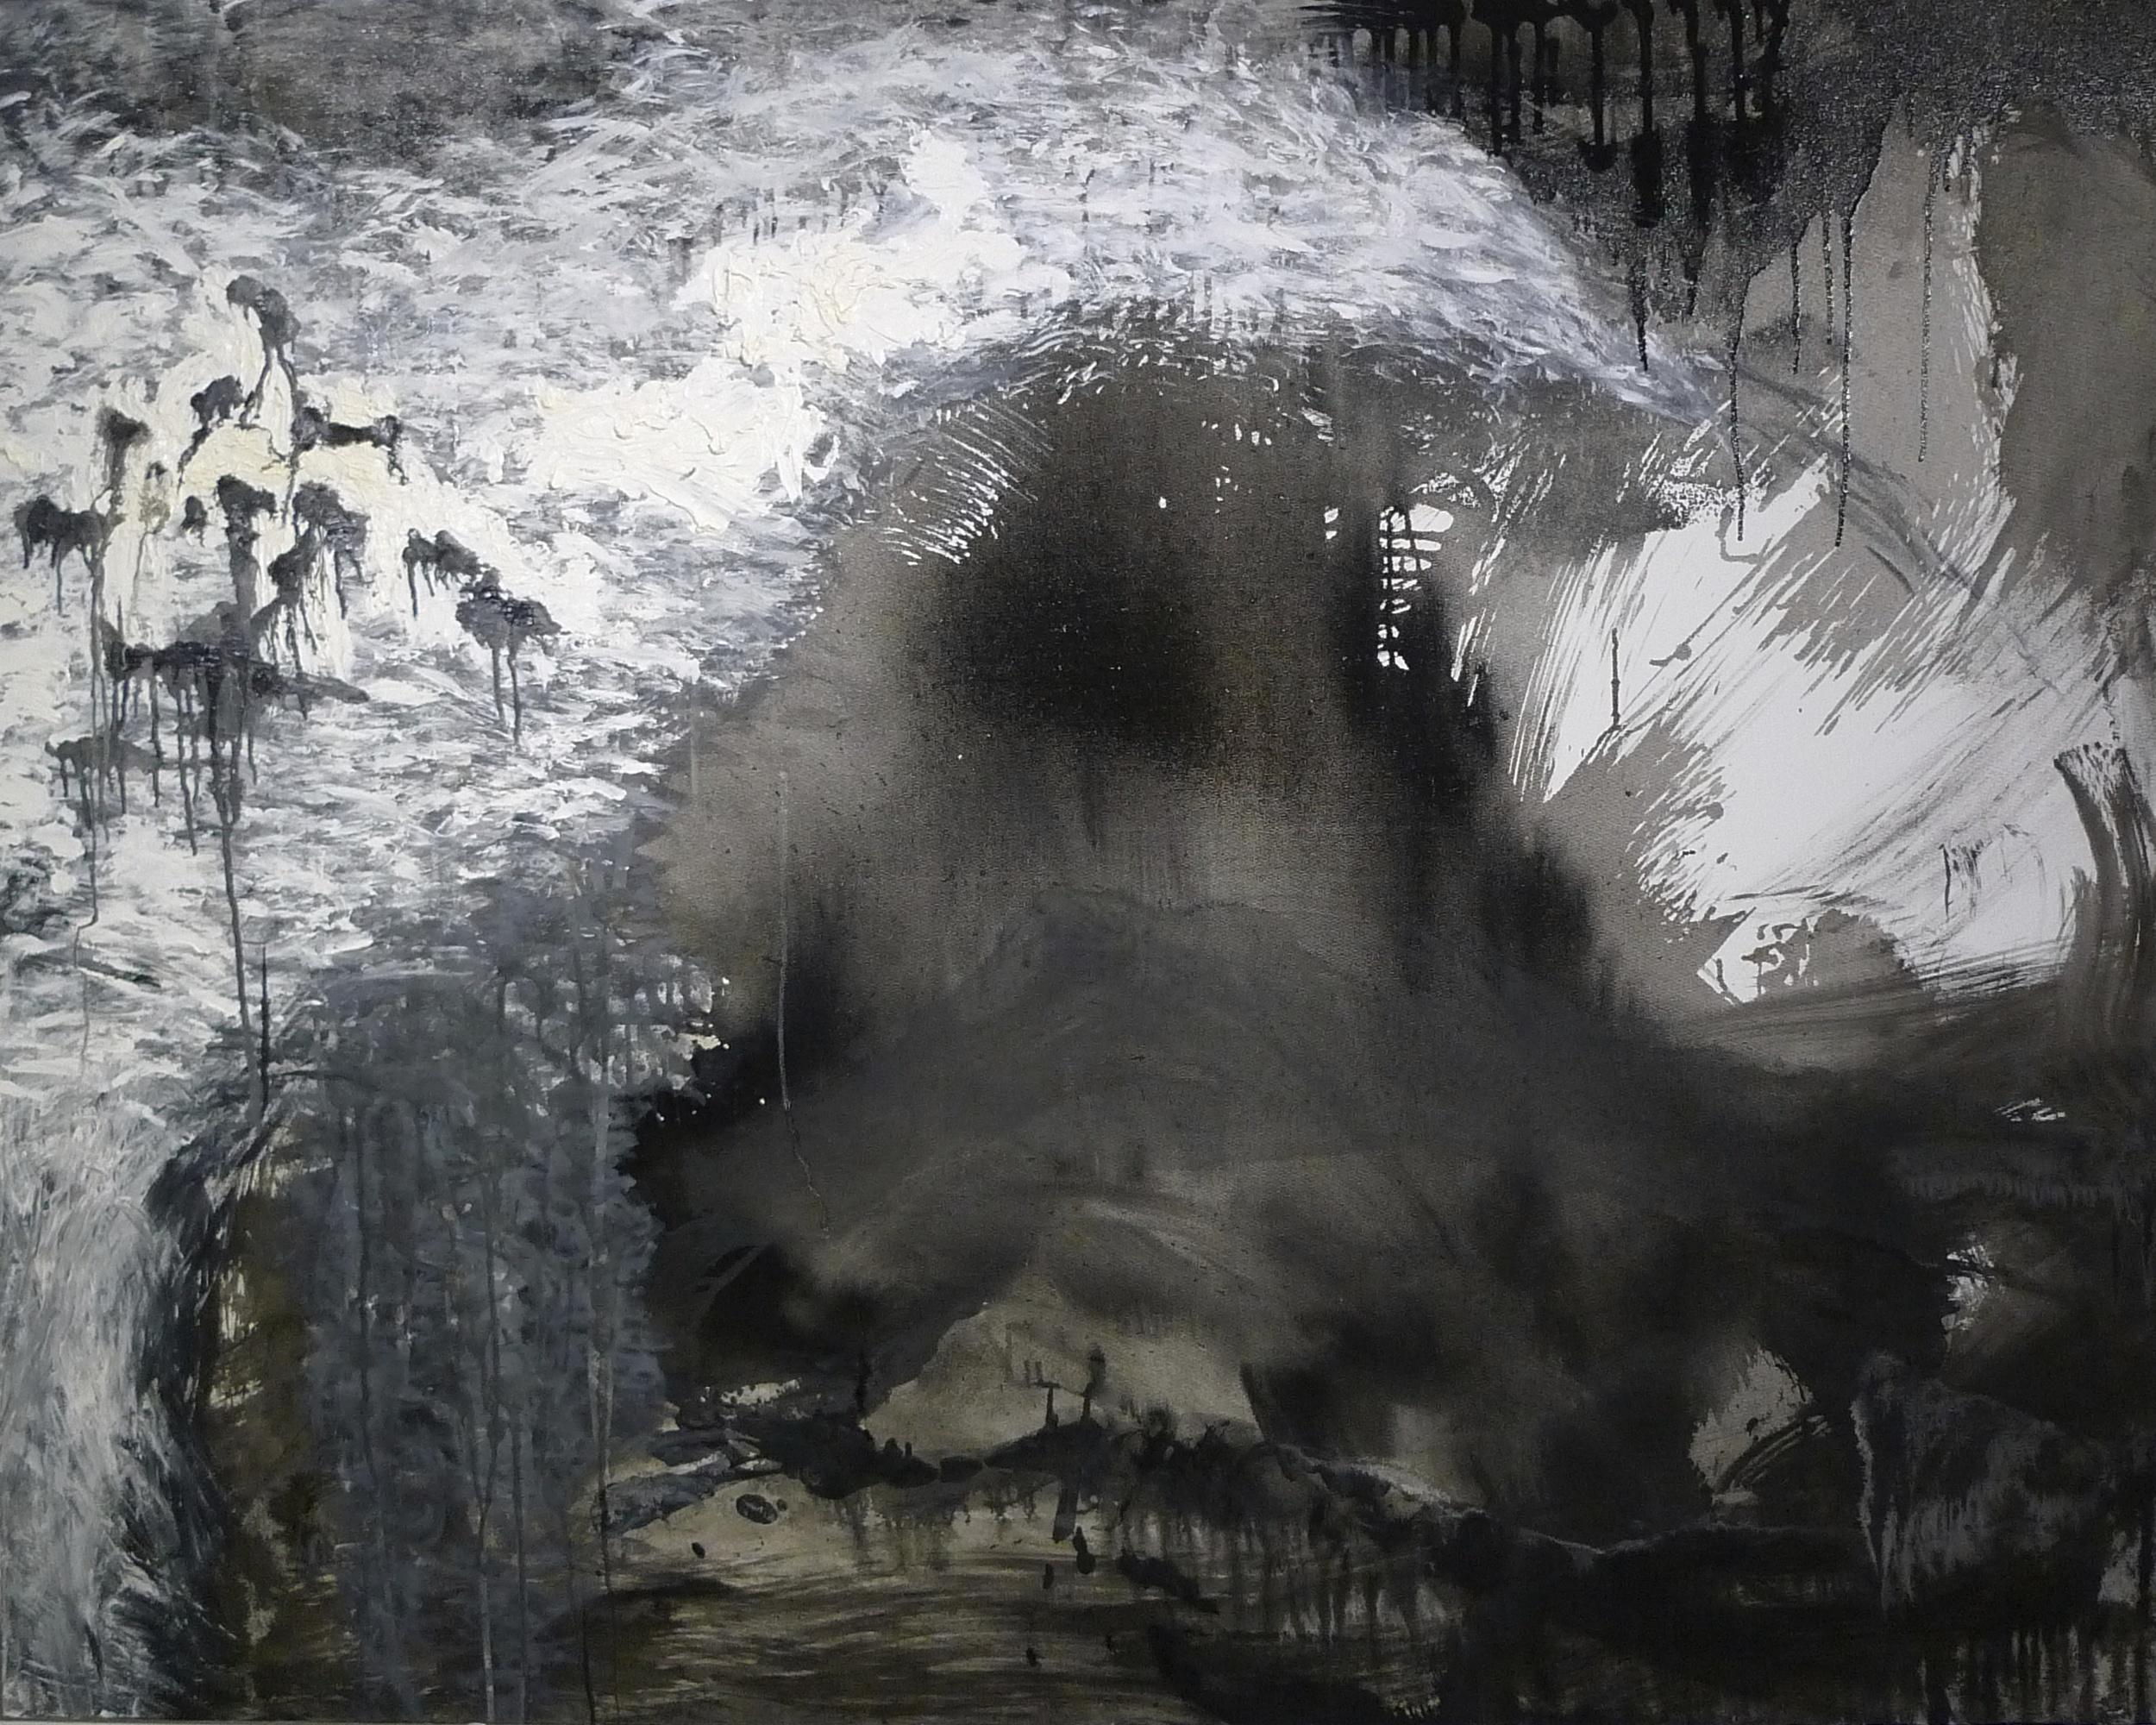 Untitled No. 10—(4/6/)